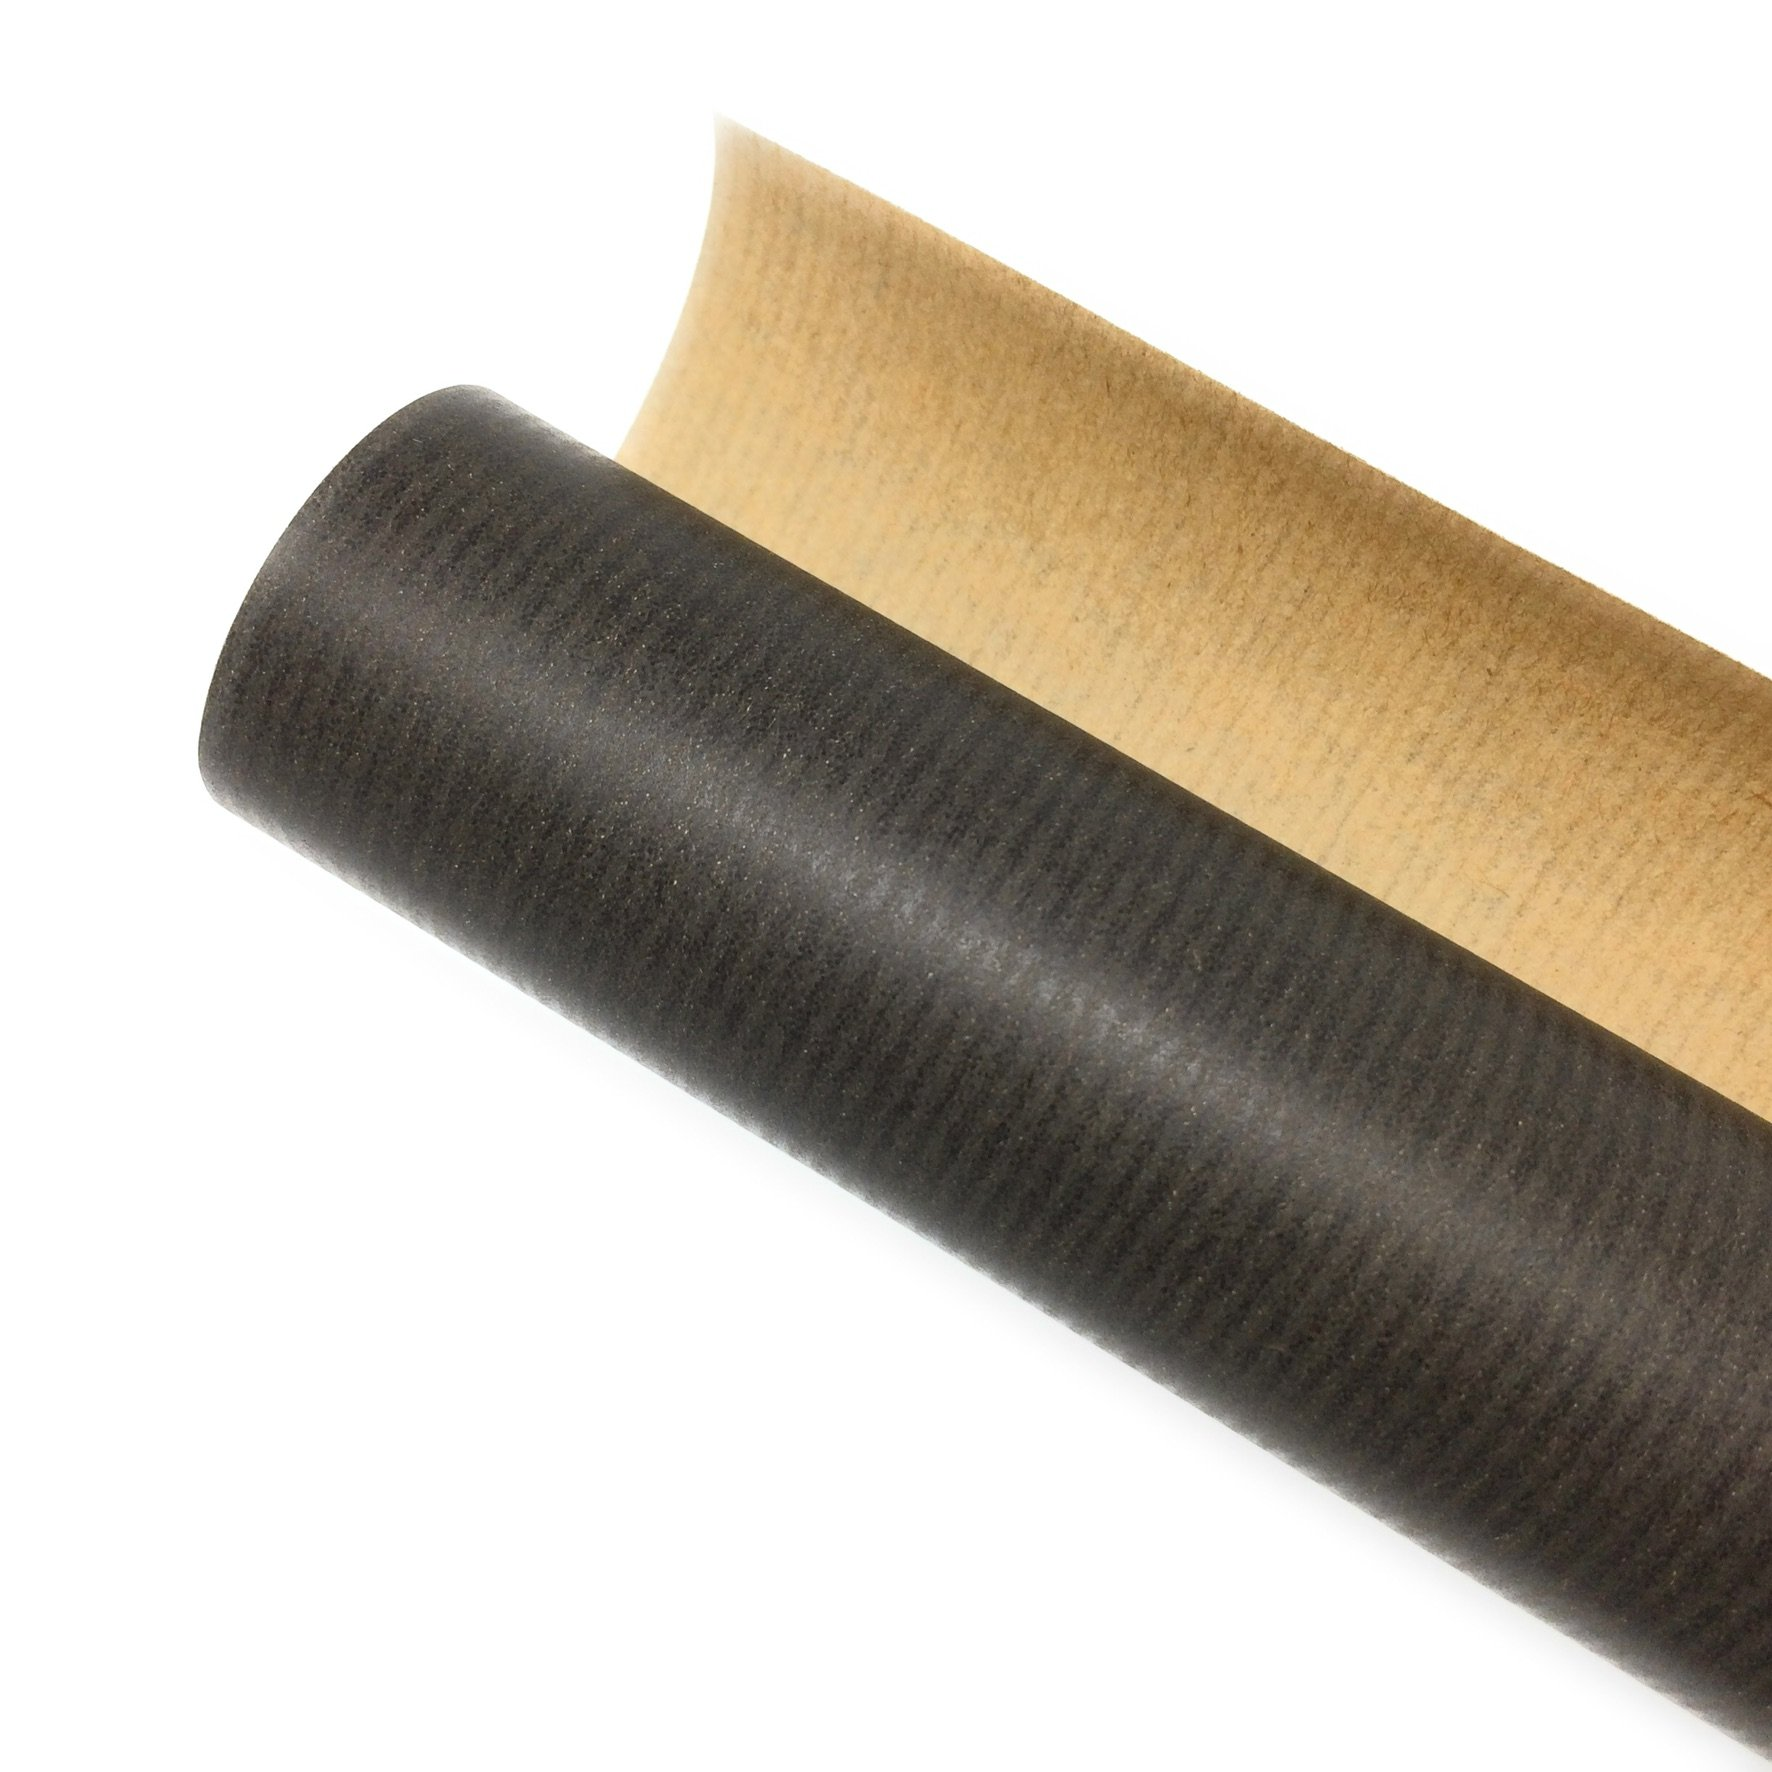 Black Kraft No. 1 – Plain Black Kraft Wrapping Paper Roll 3m 100% Recycled